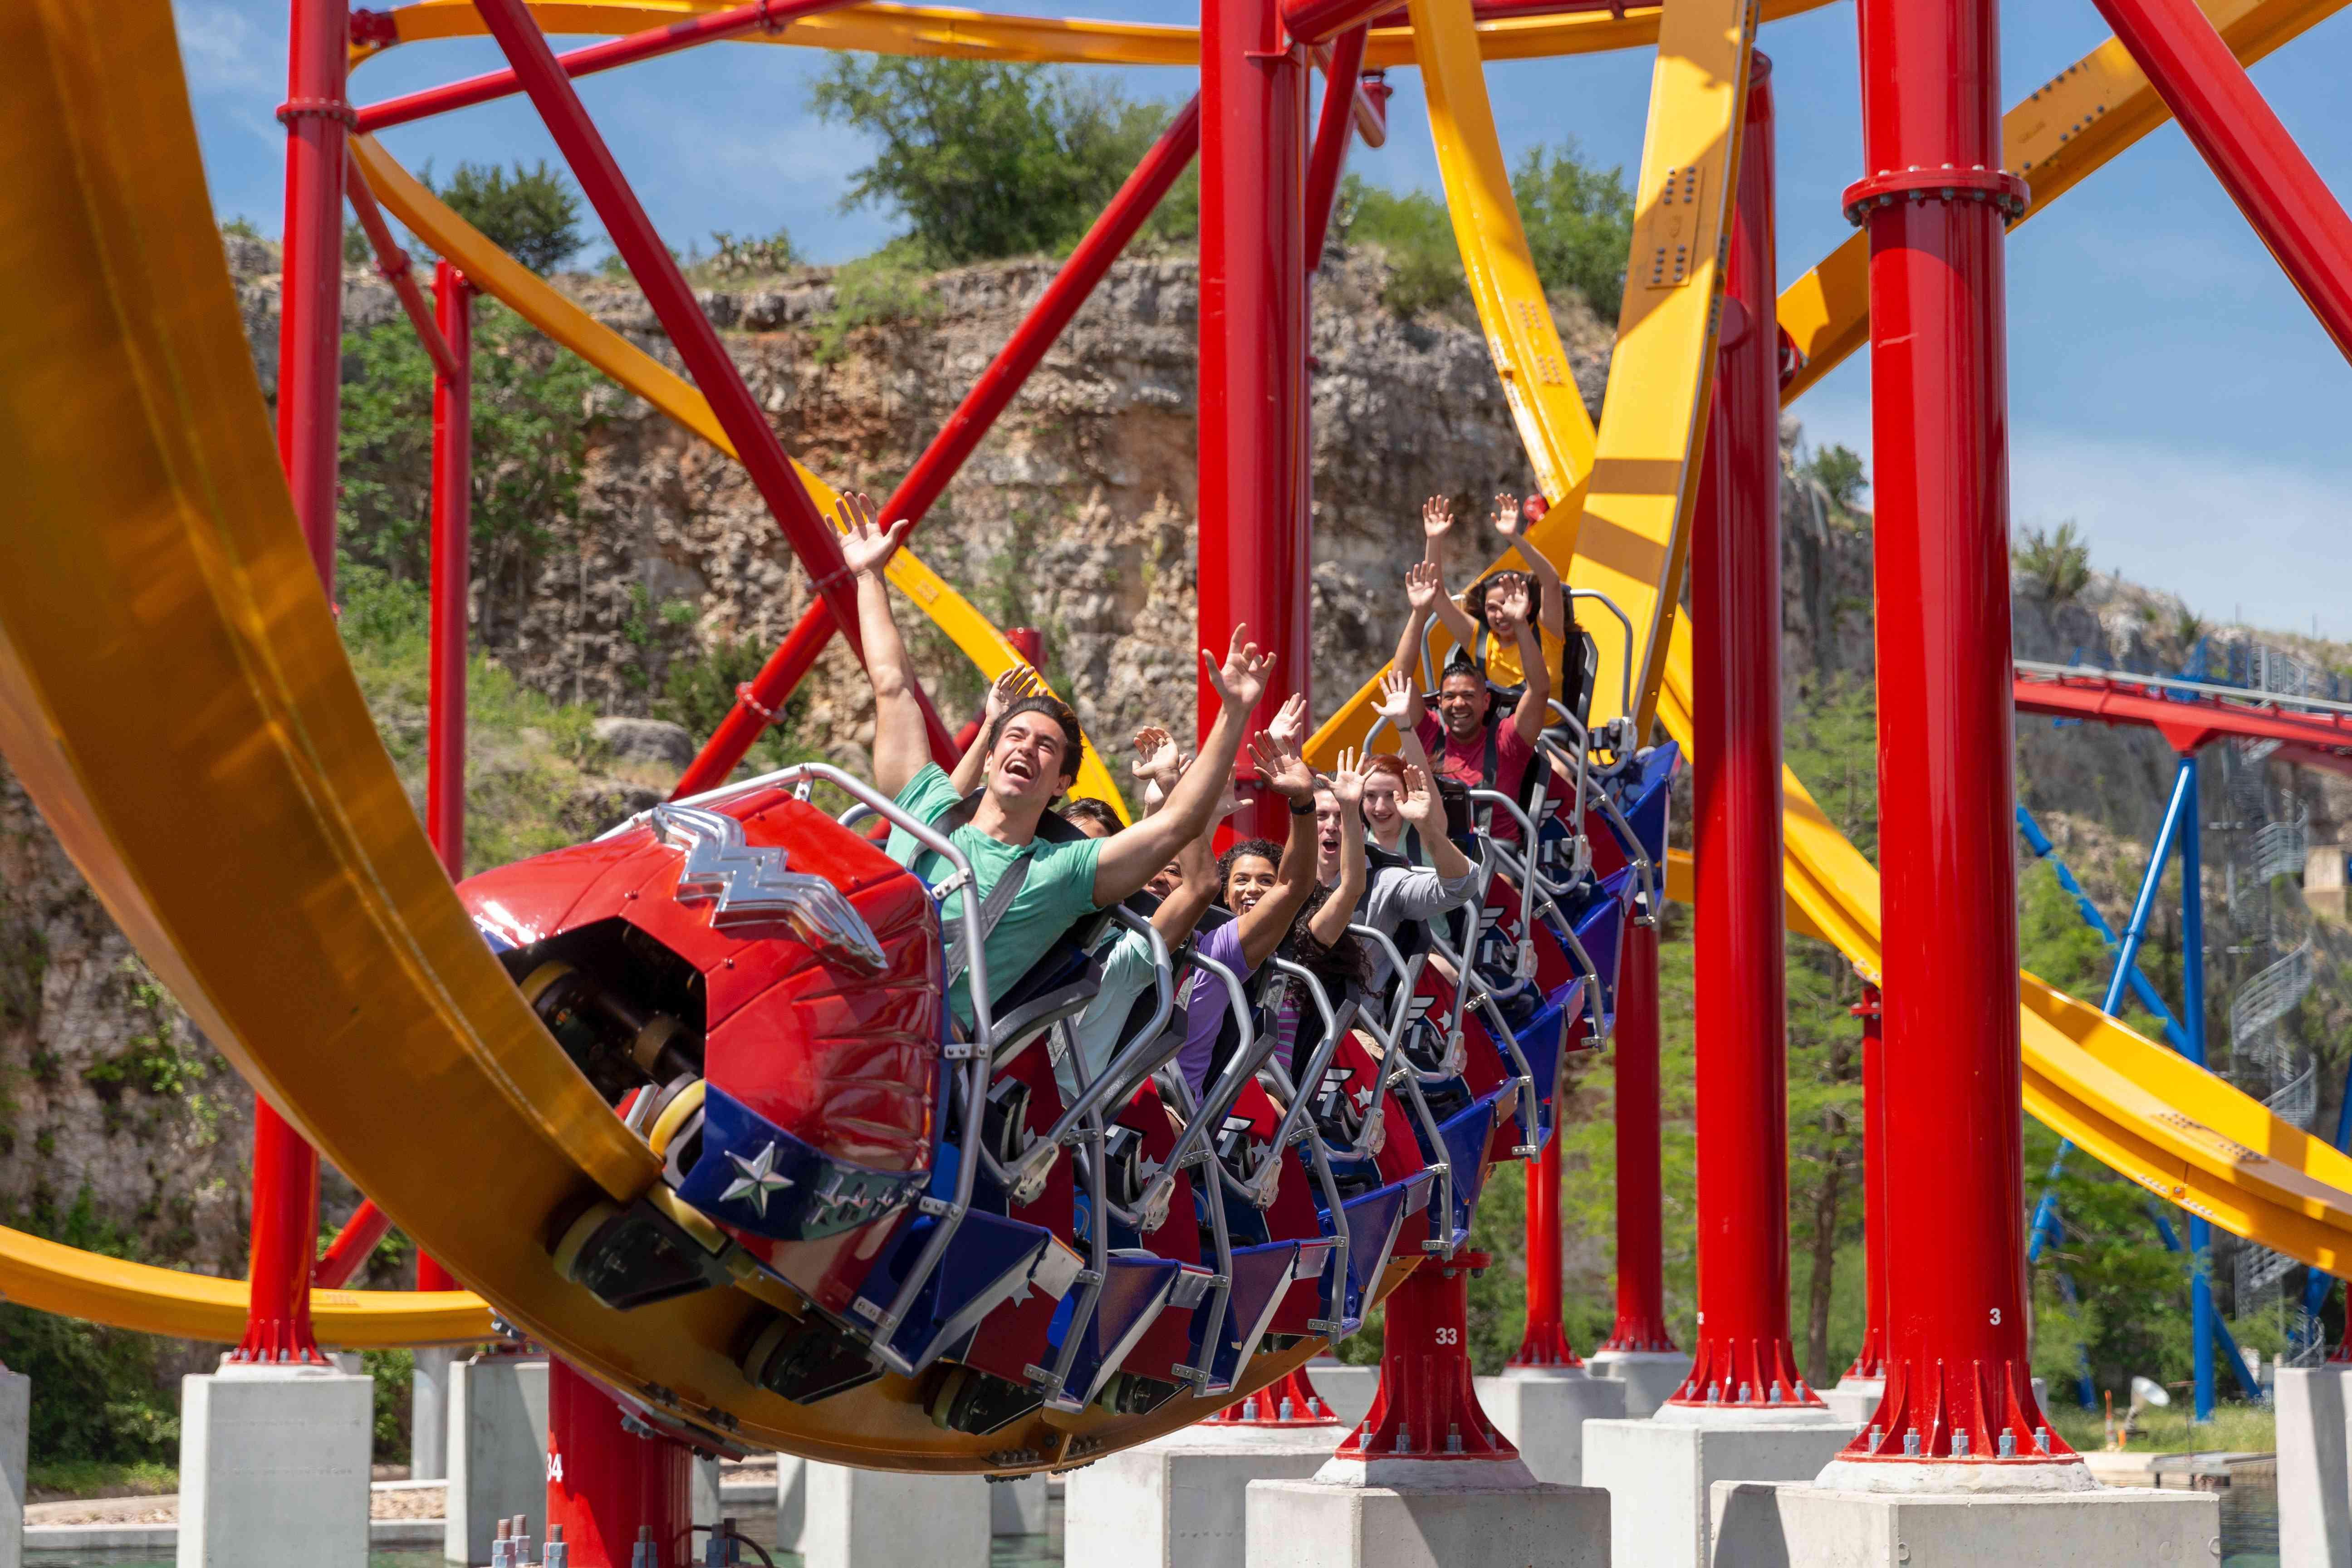 Wonder Woman coaster Six Flags Fiesta Texas